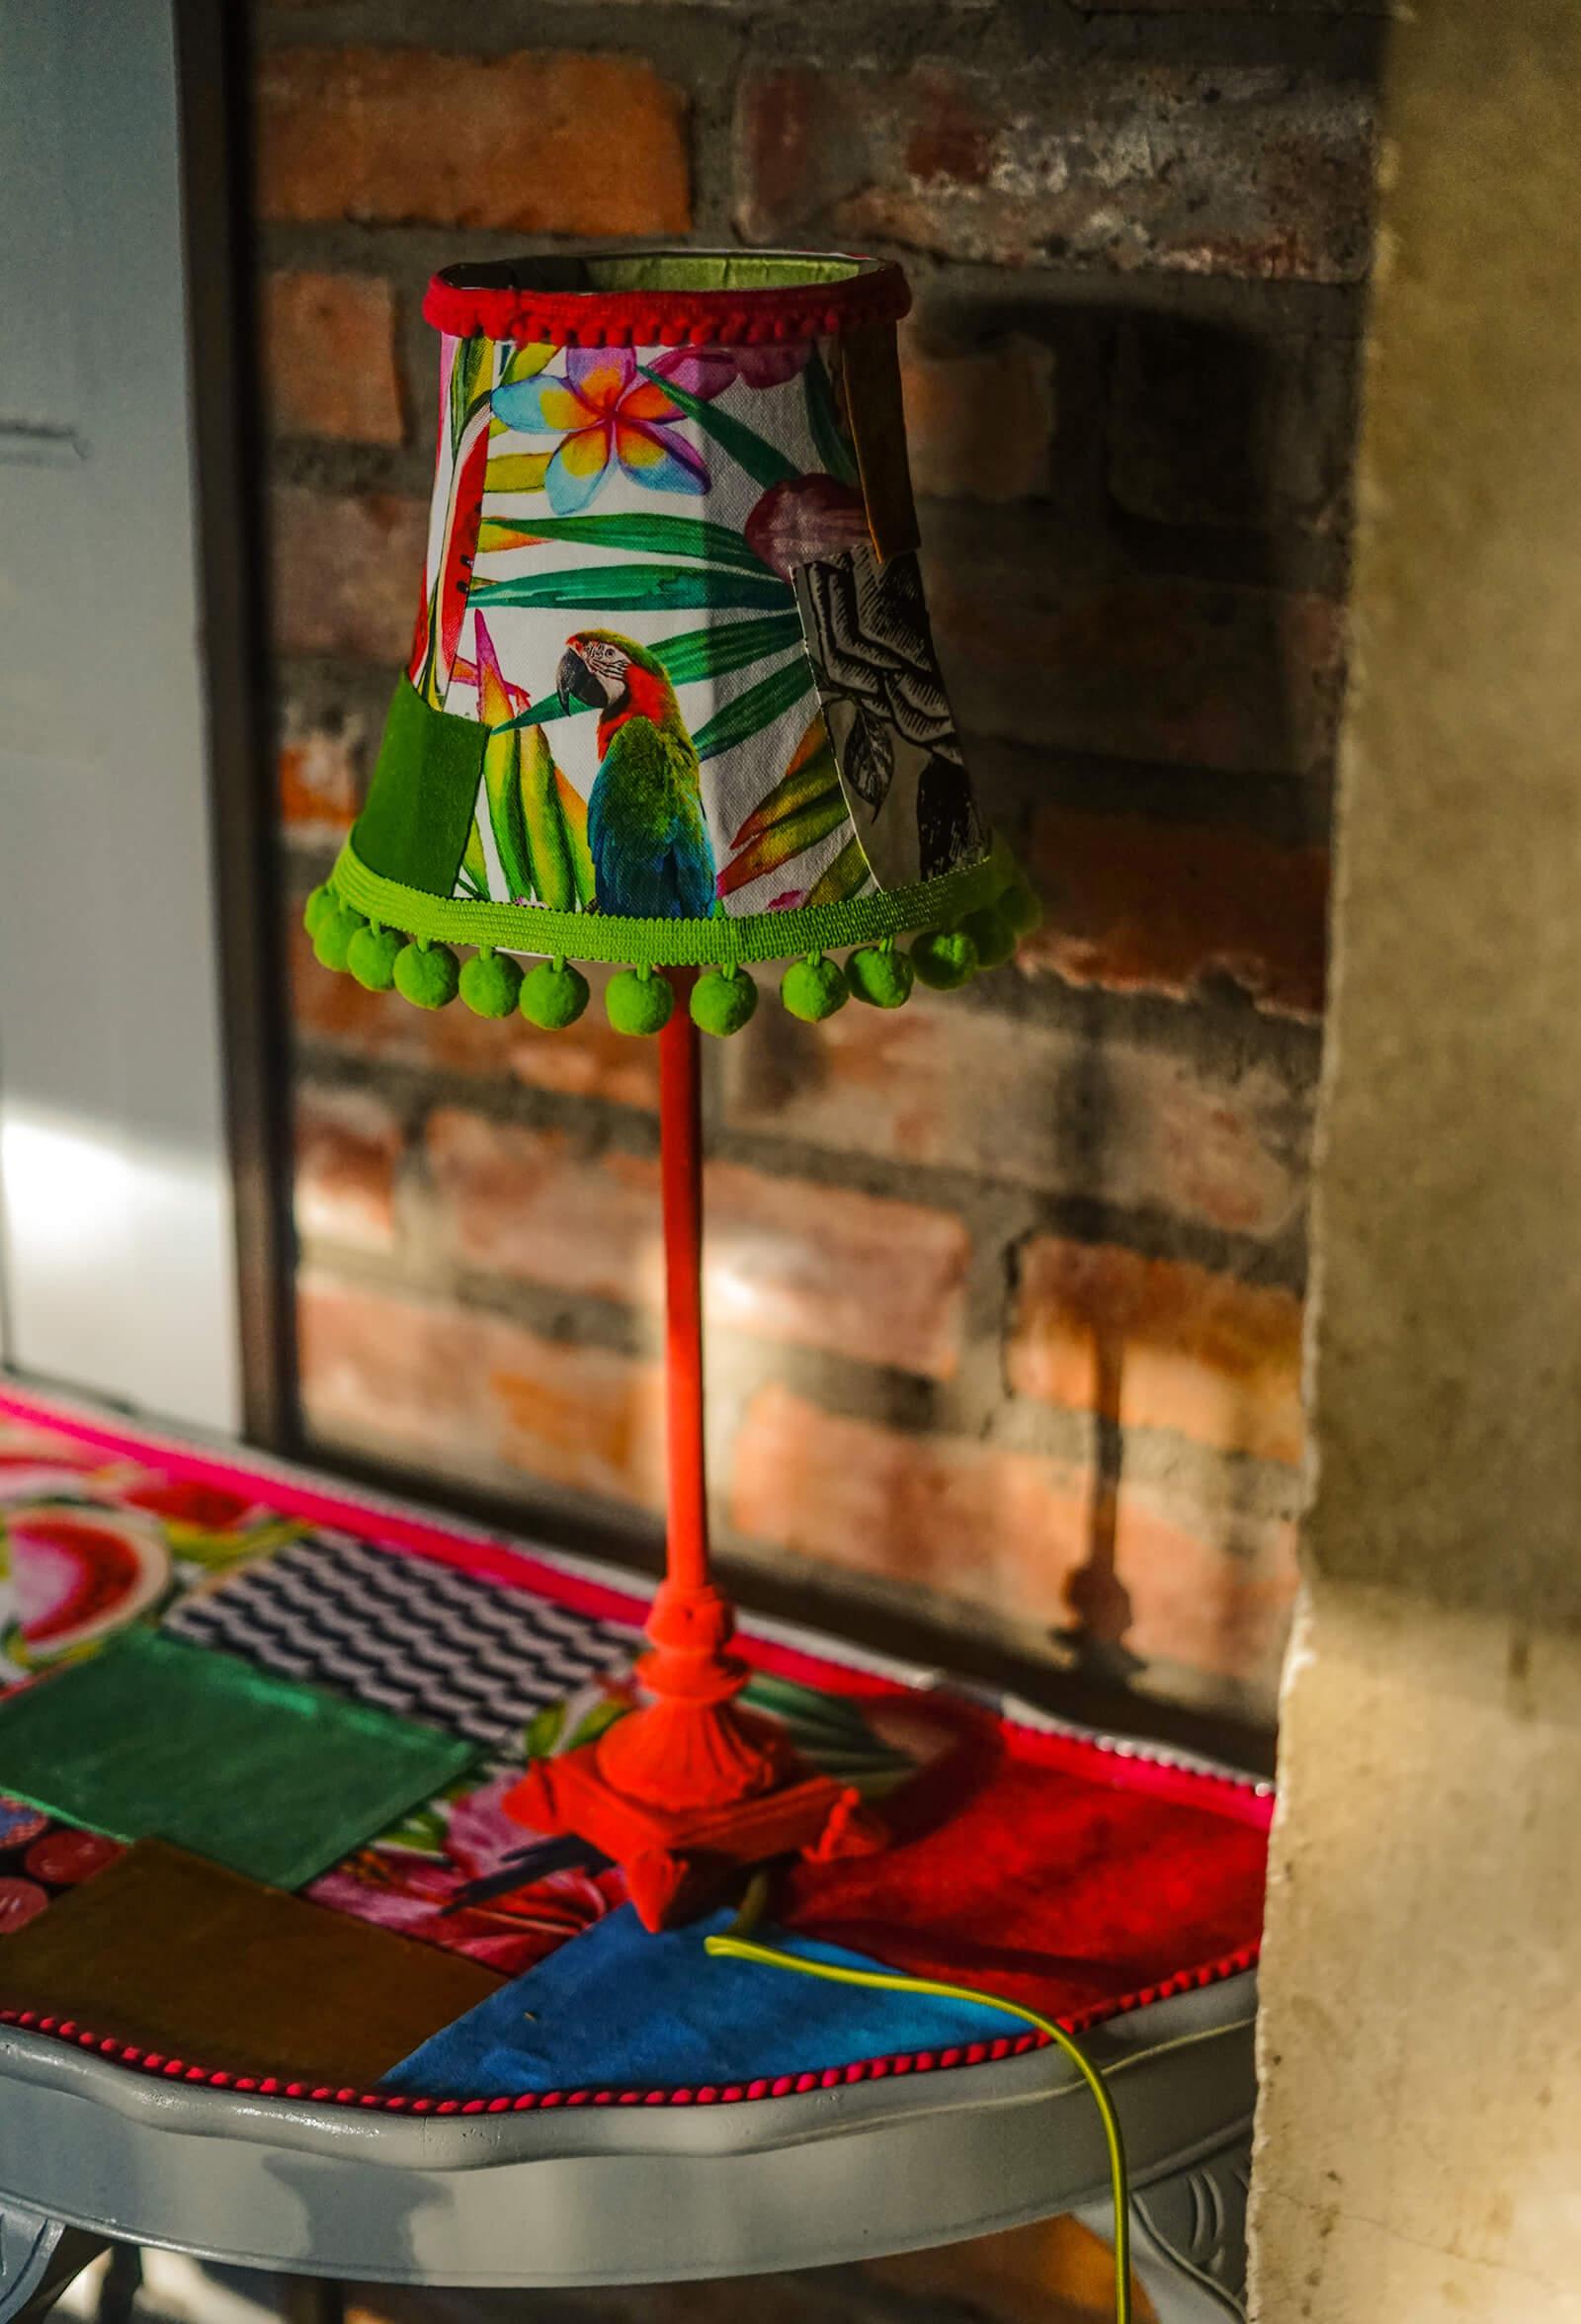 juicycolors_meble na lampy na zamówienie_meble ludwik (1)